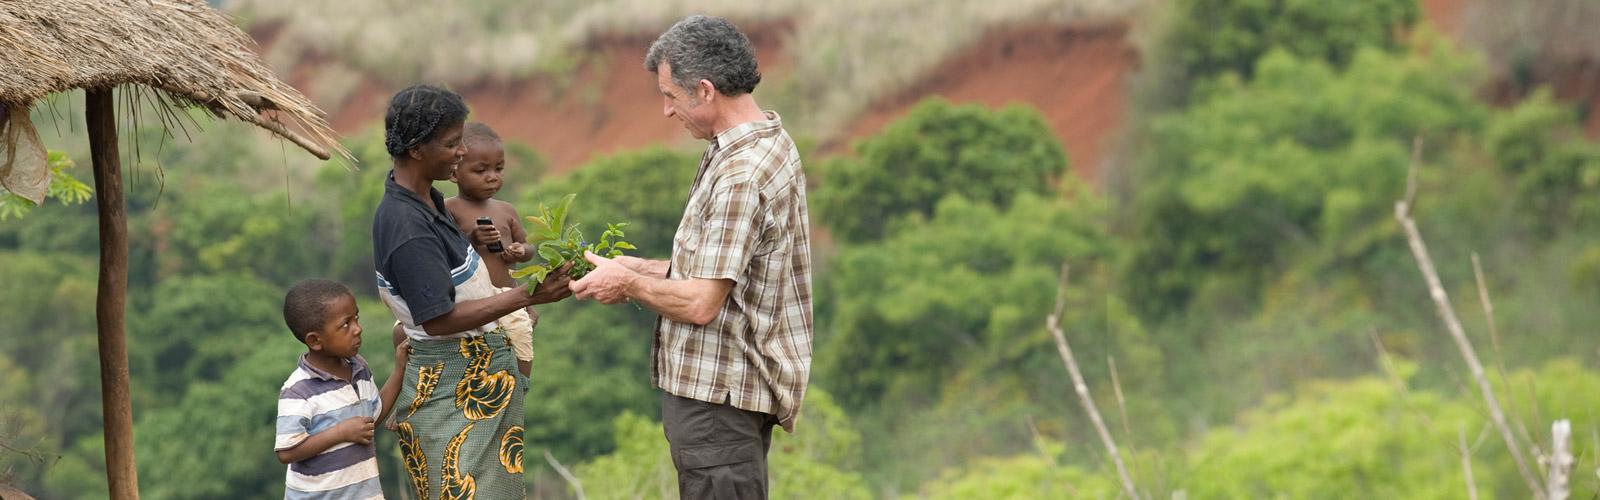 Jean Pierre Nicolas在马达加斯加